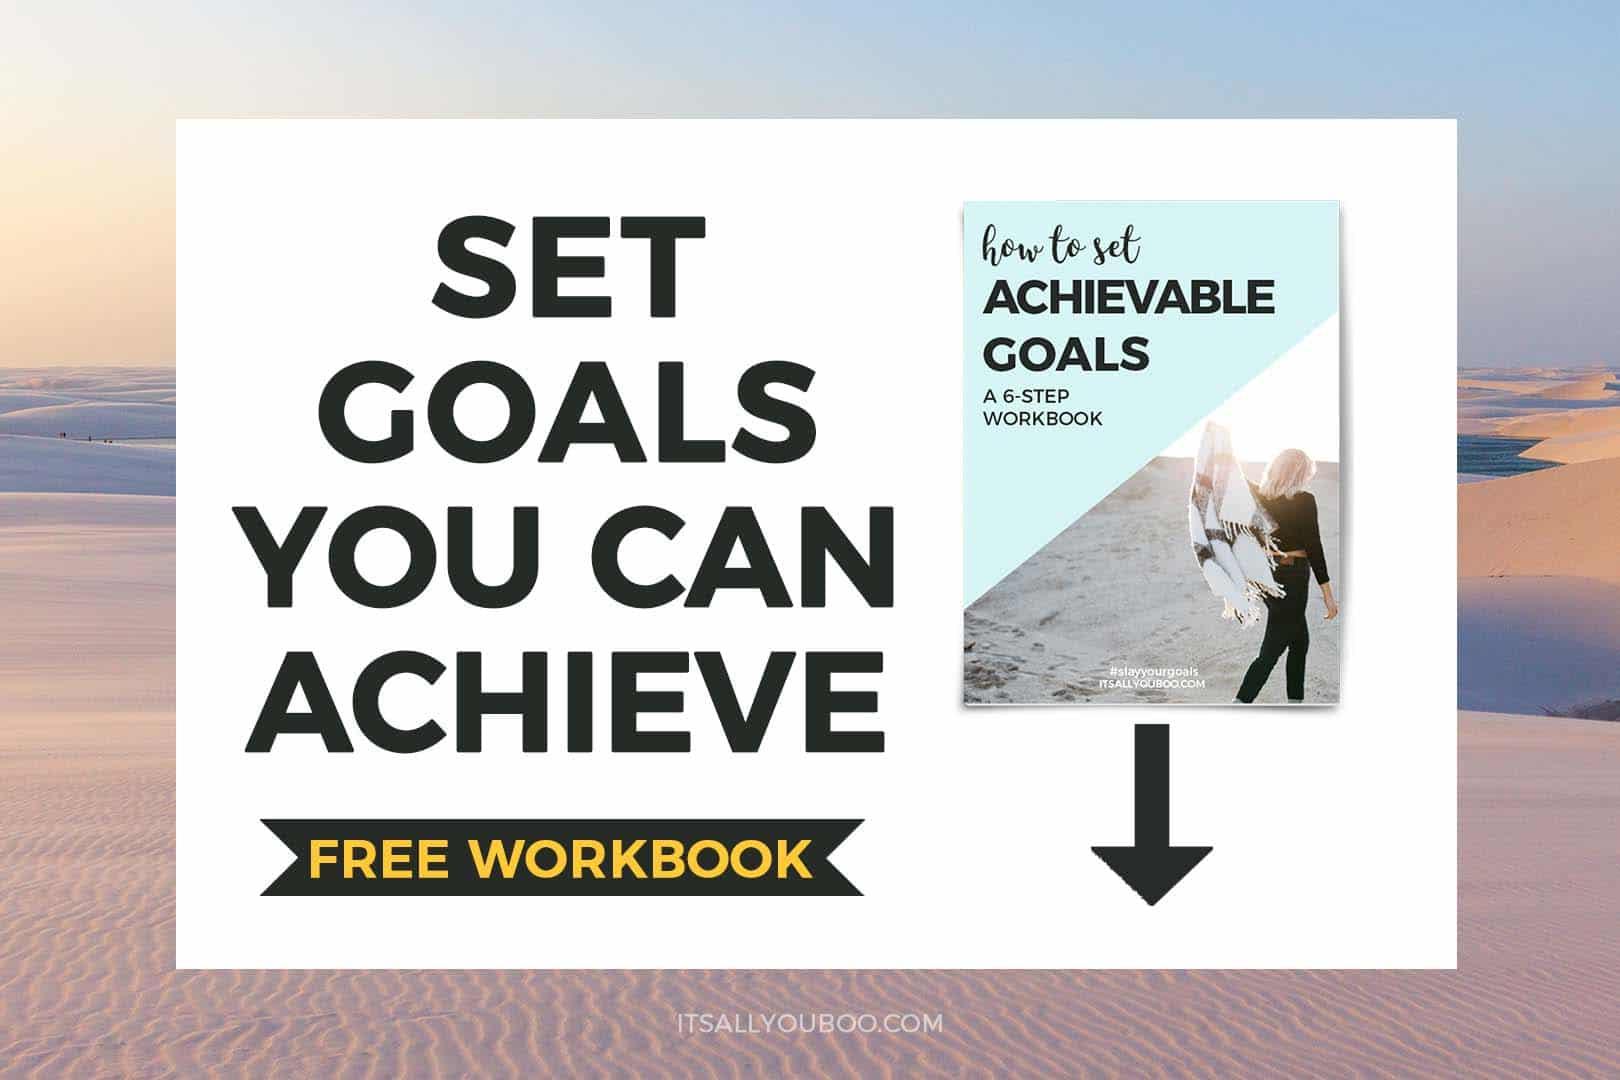 Set Goals You Can Achieve FREE Workbook